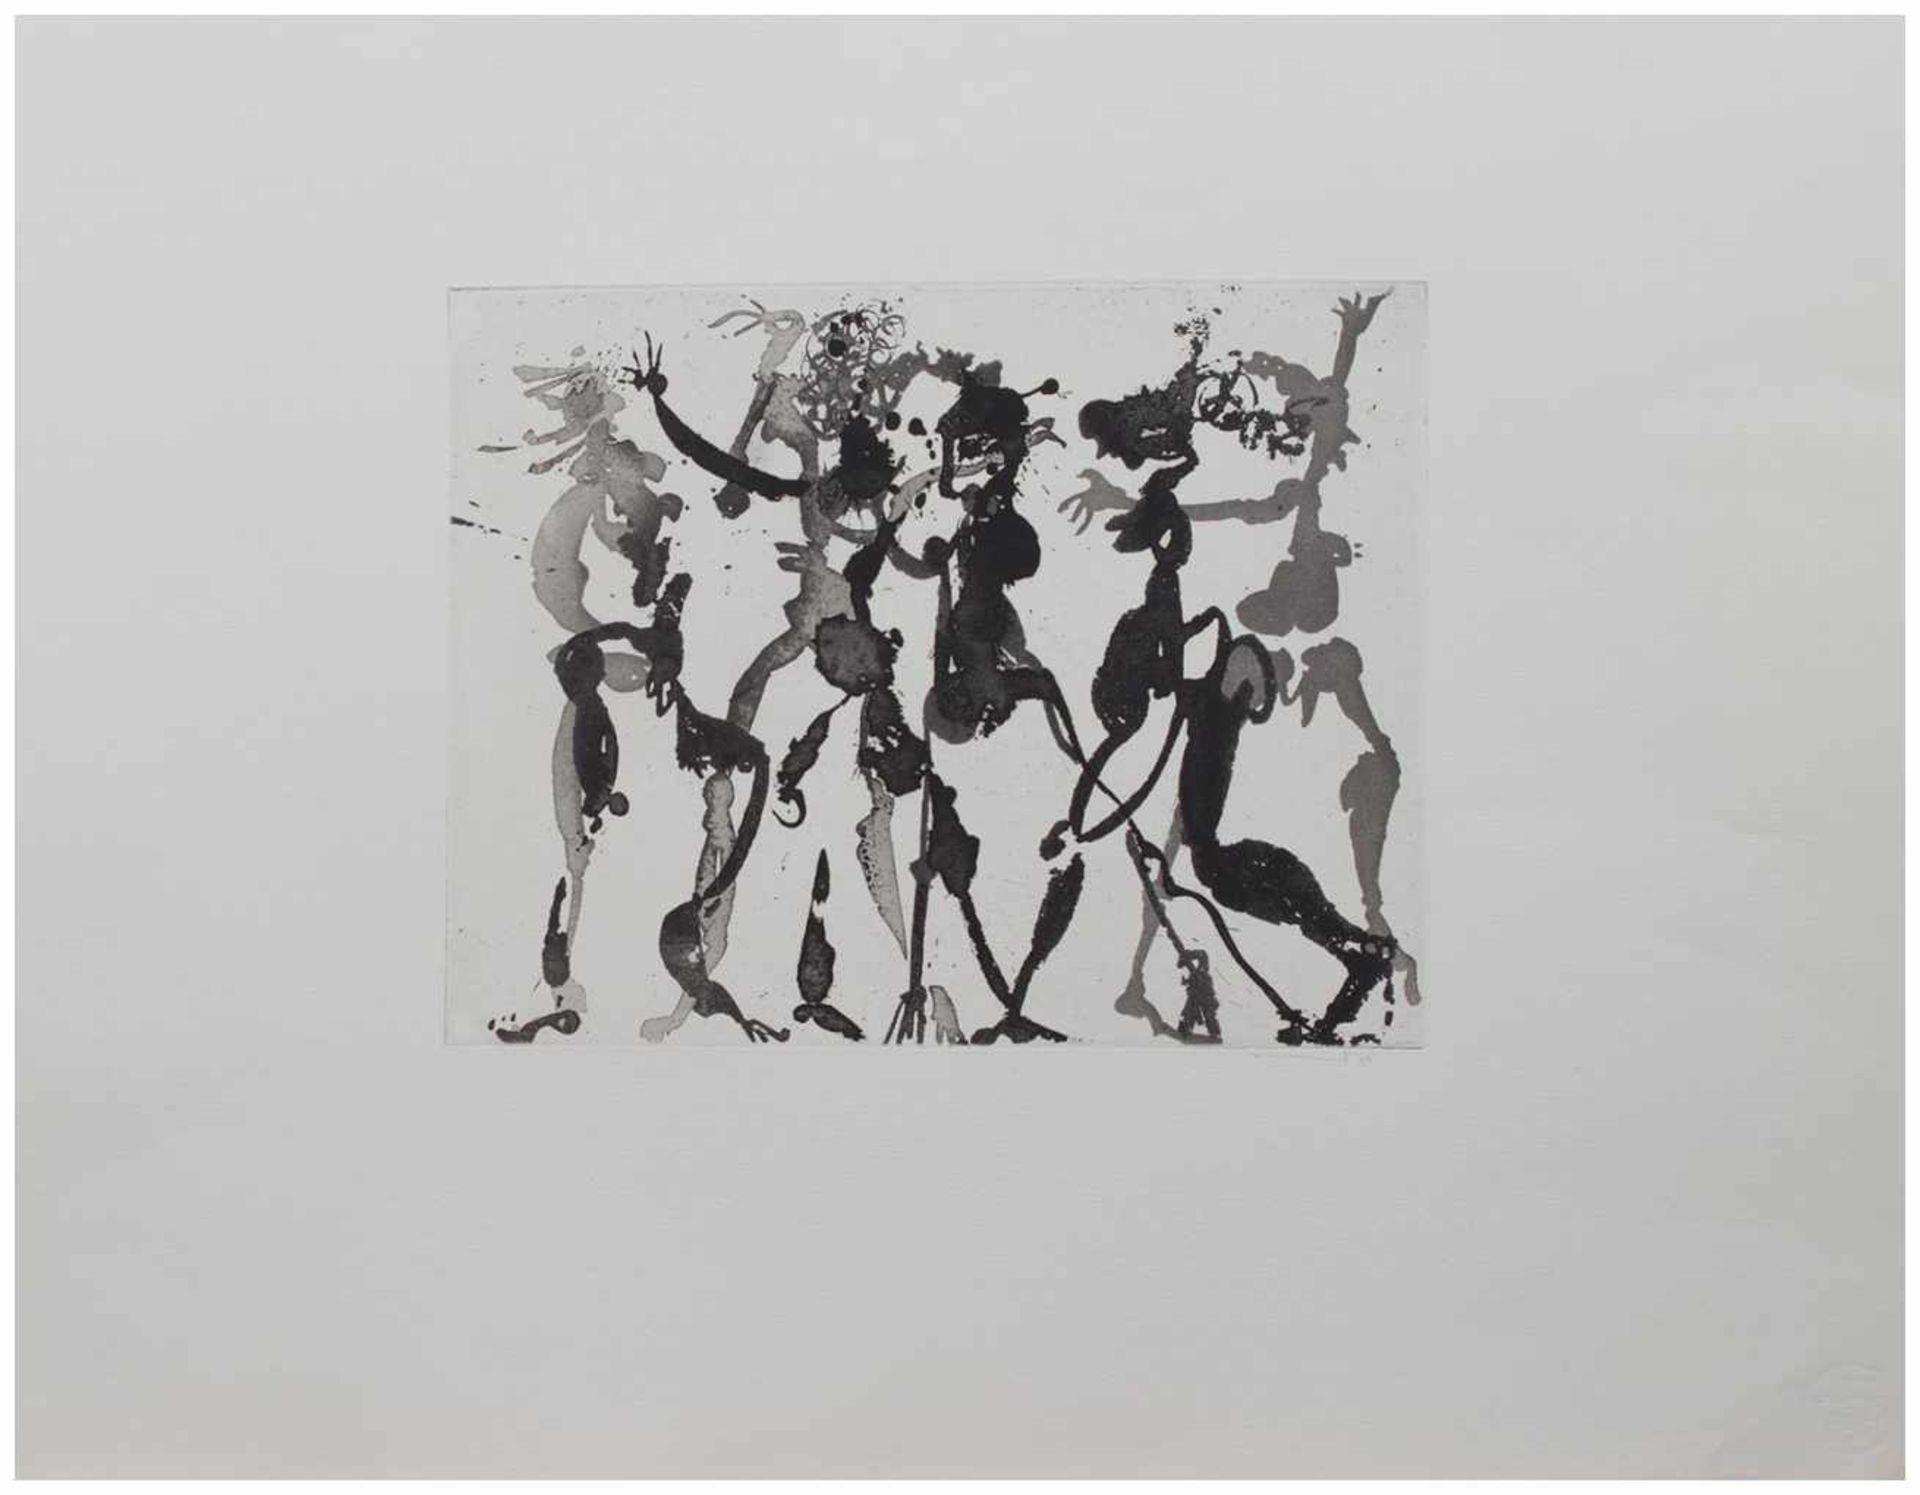 Los 35 - Armin Sandig (Hof/ Saale 1929 - 2015 Hamburg, deutscher Maler u. Grafiker, Autodidakt, beeinflusst